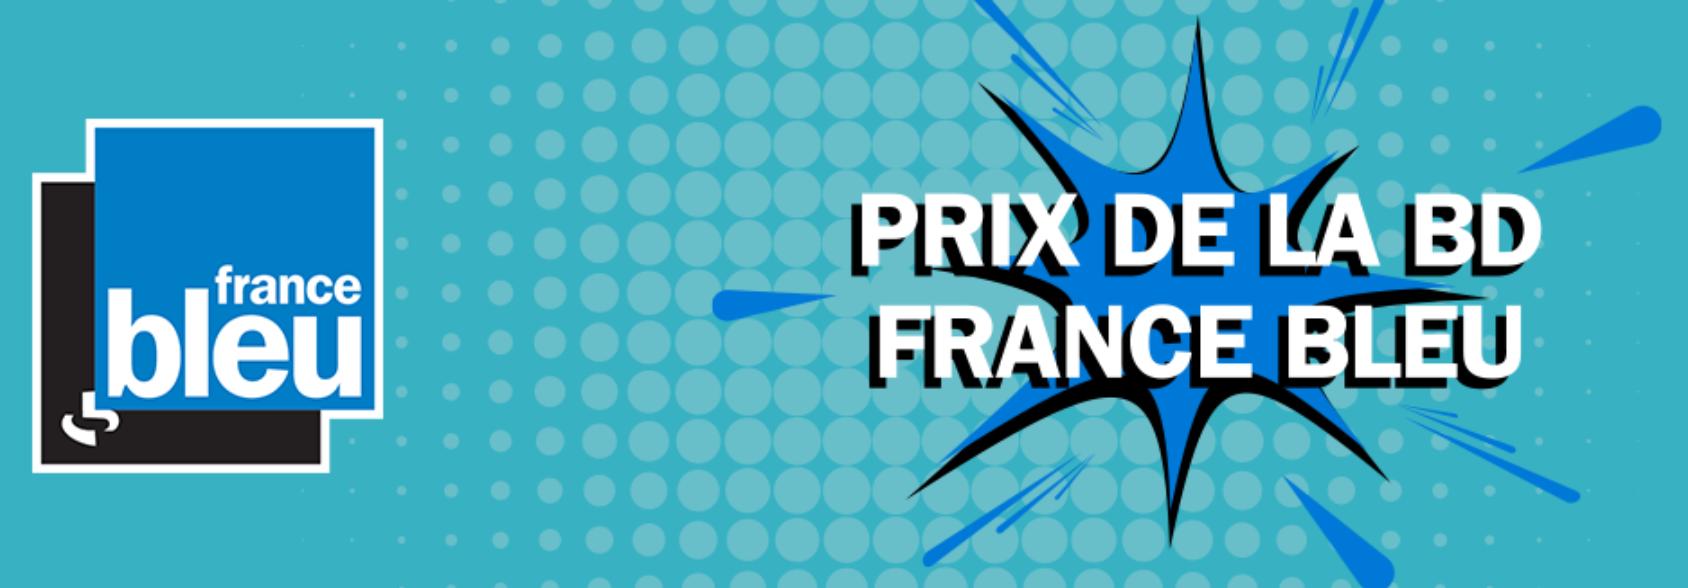 "France Bleu lance ""Le prix de la BD France Bleu"""